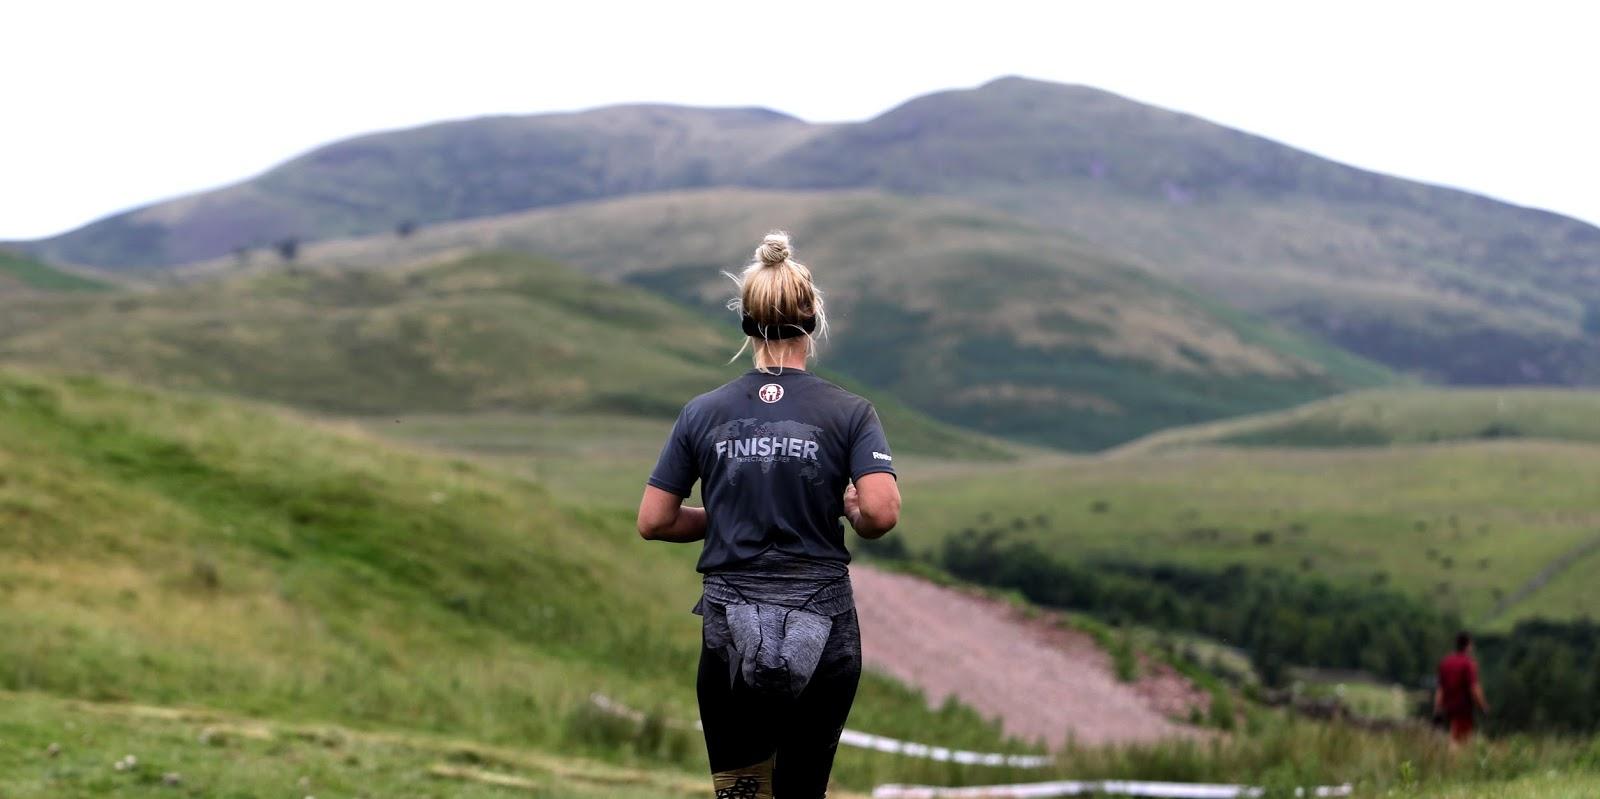 43 hodin v Edinburghu - část II. - Spartan Race  68c5c952563